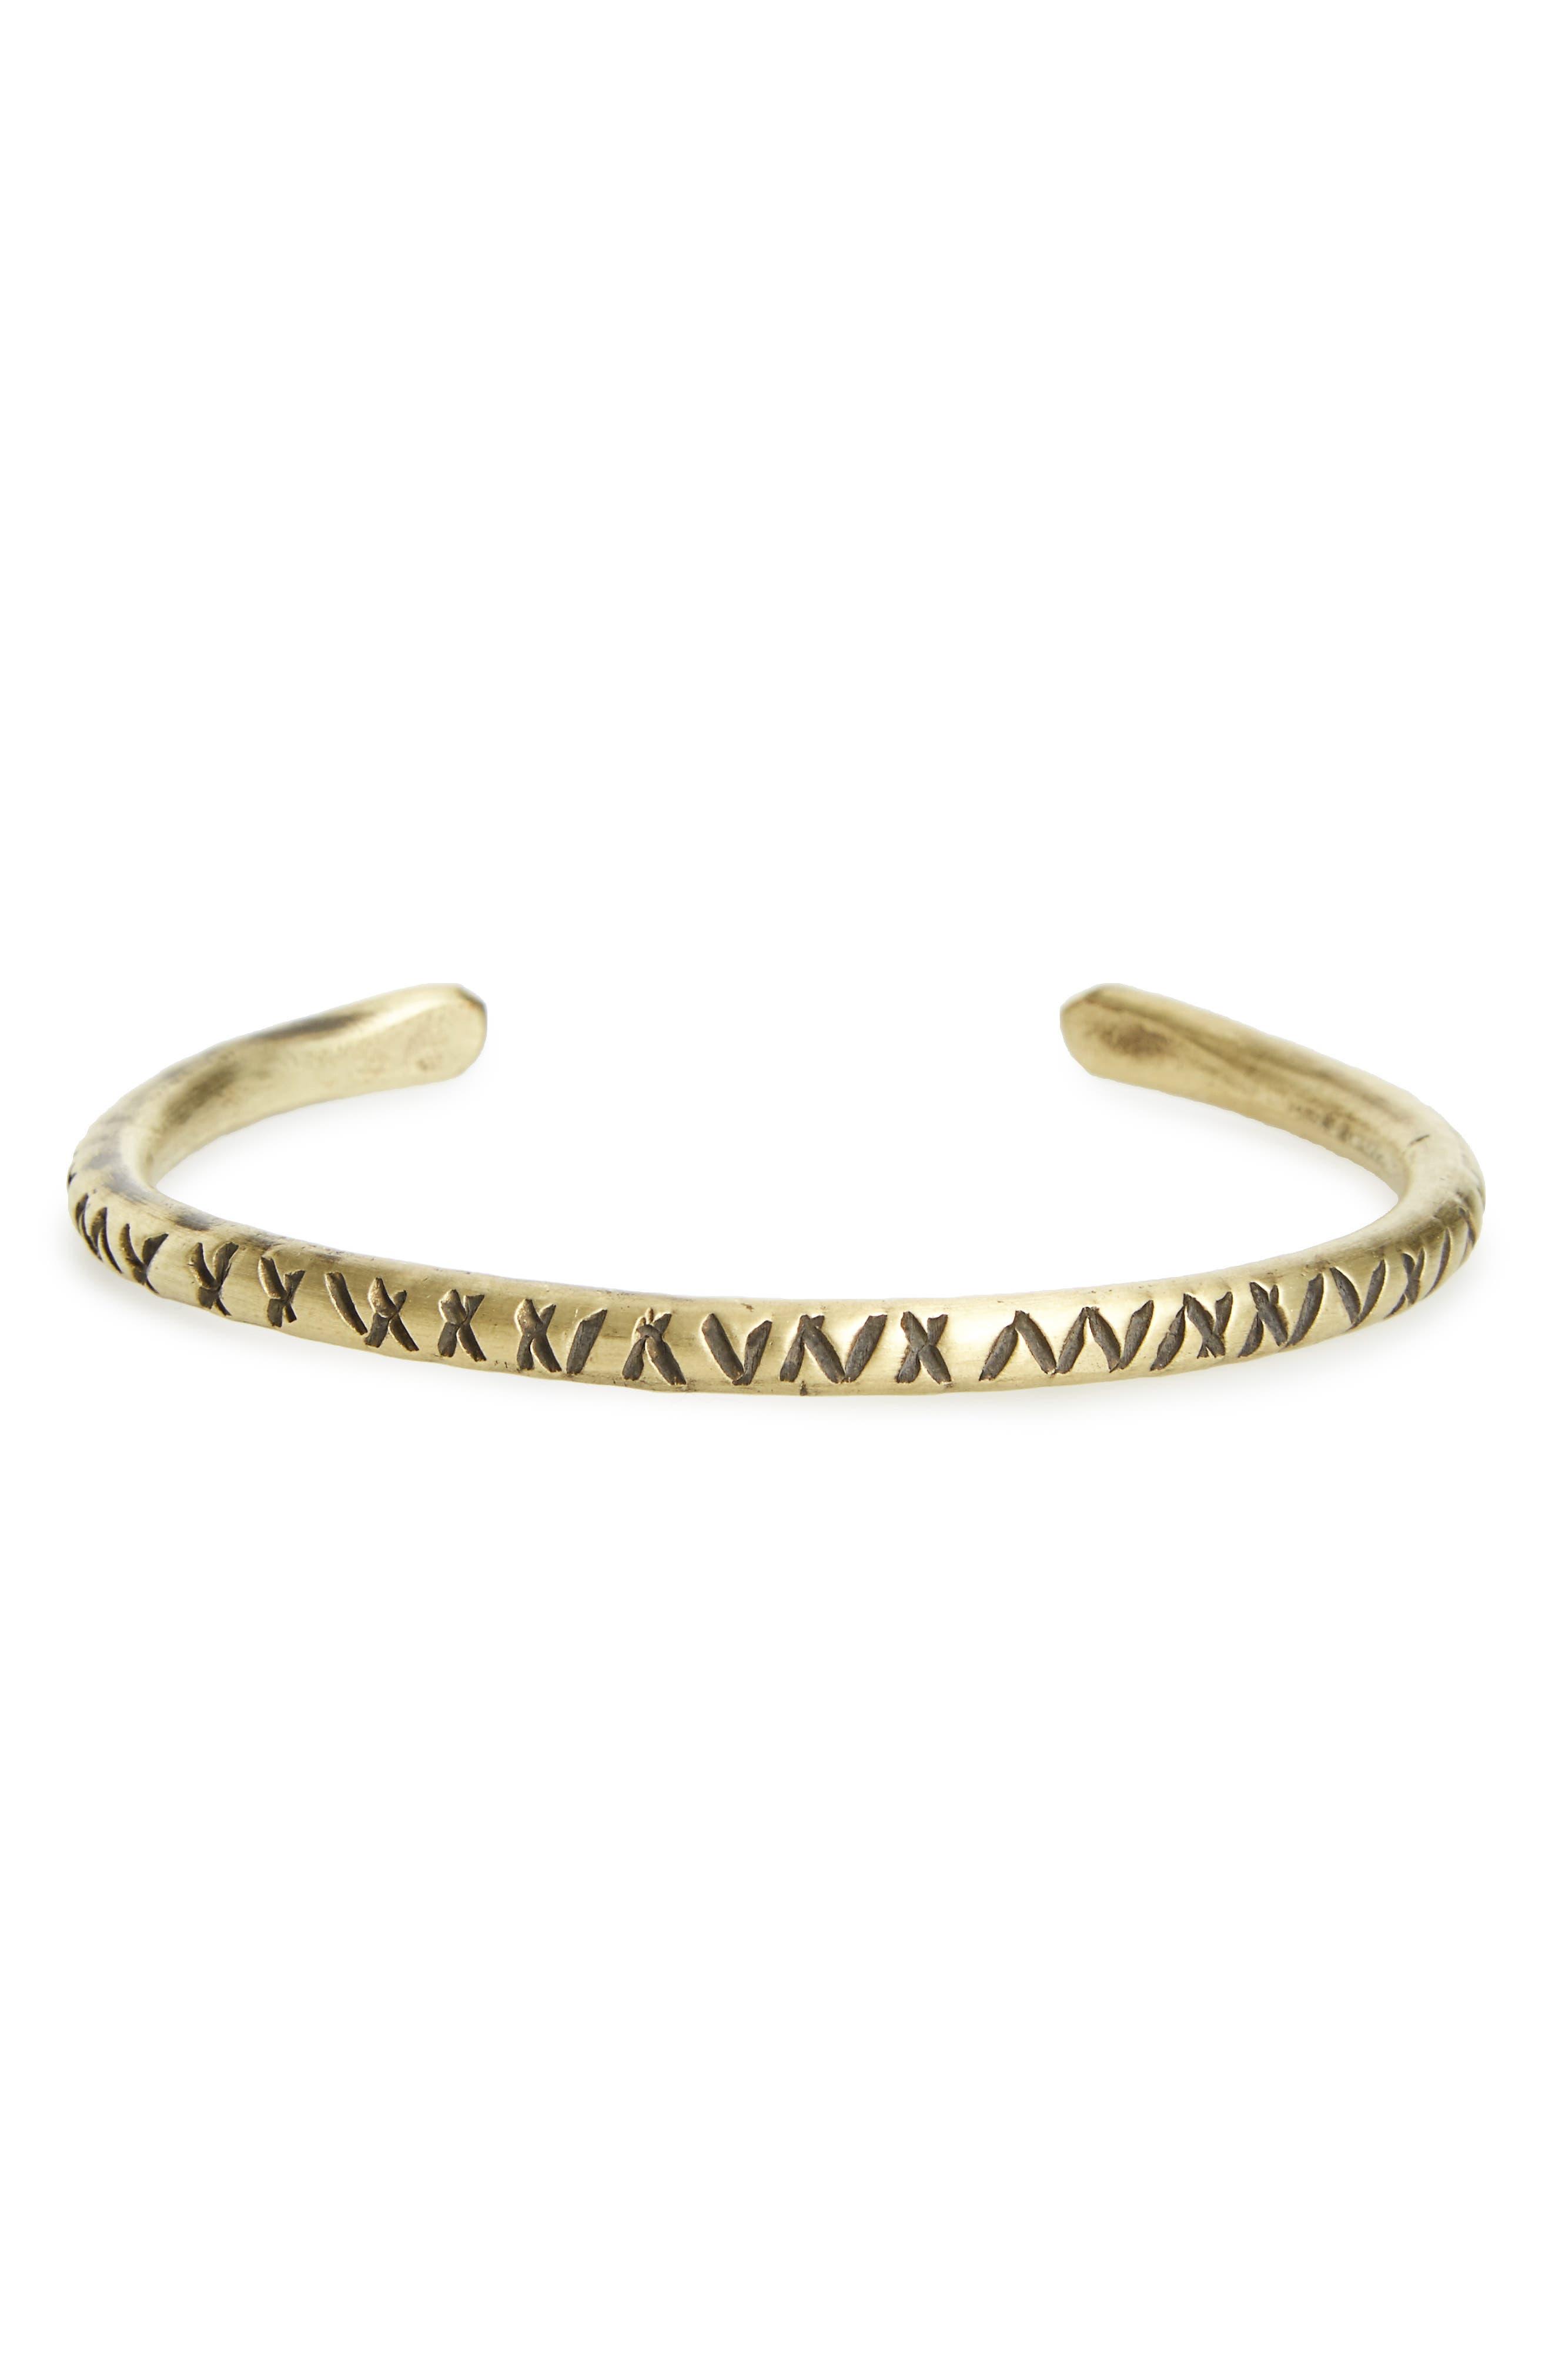 Brass Cuff Bracelet,                             Main thumbnail 1, color,                             220